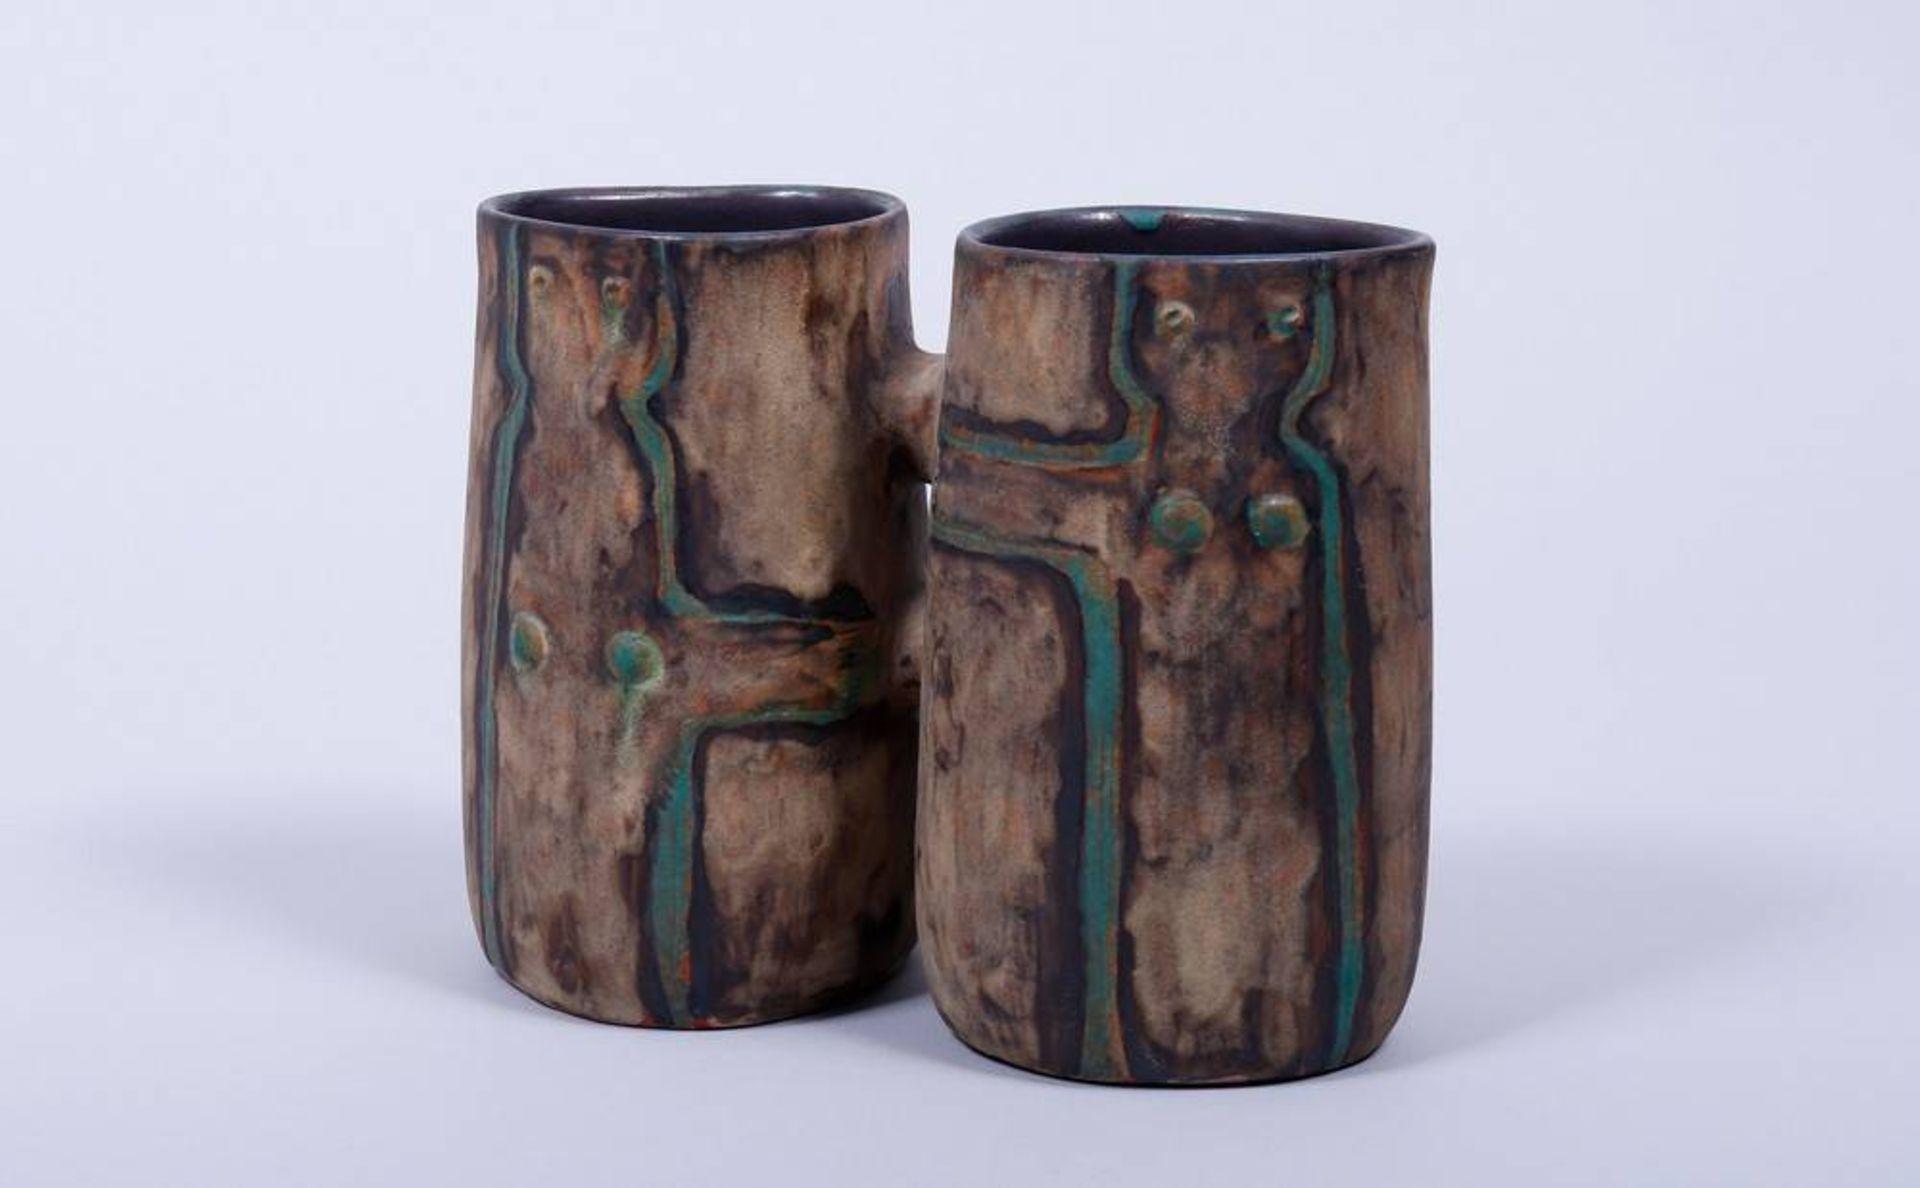 Doppel-Vase, Entwurf Eva Fritz-Lindner (1933-2017) für Staatliche Majolika Manufaktur Karlsruhe,